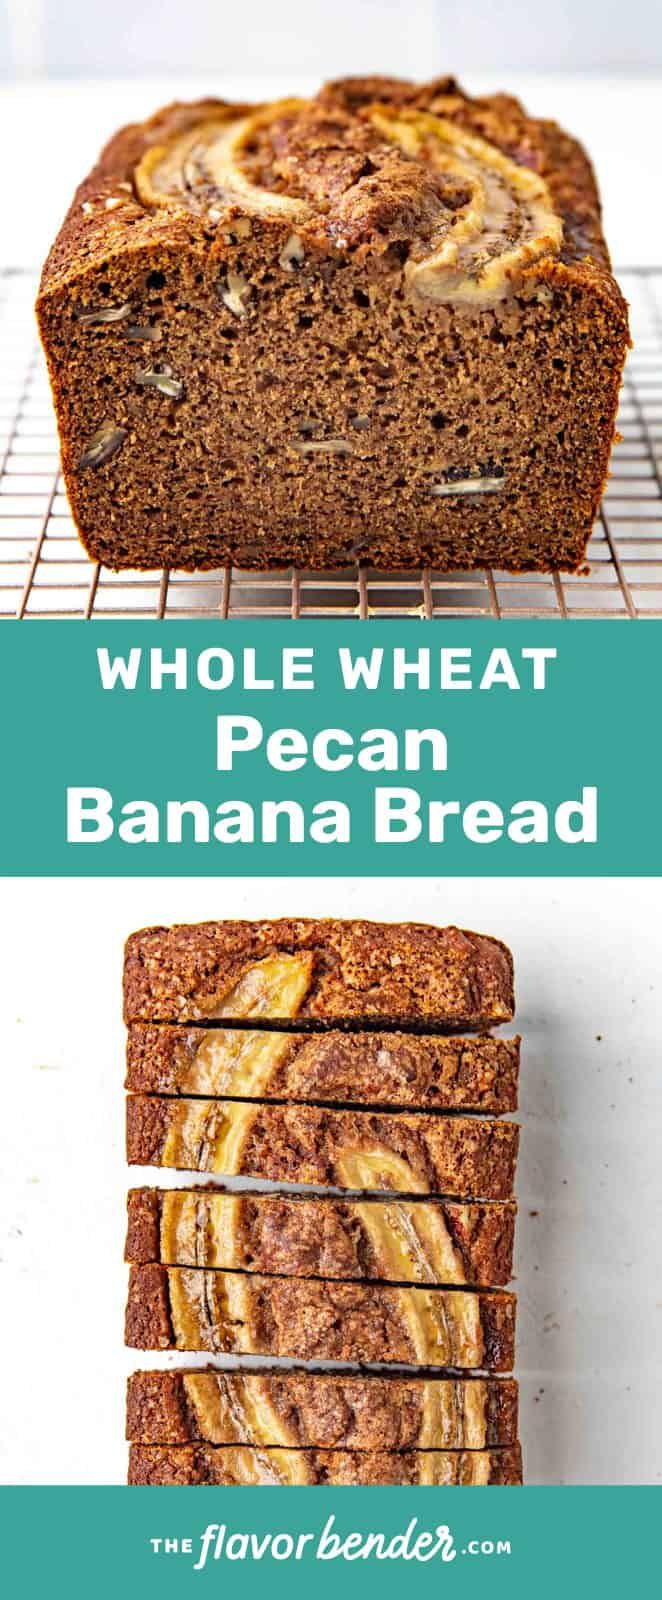 Incredibly Light Moist Banana Bread Made With Whole Wheat Flour Delicious Whole Wheat Banana Bread In 2020 Banana Pecan Bread Whole Wheat Banana Bread Wheat Banana